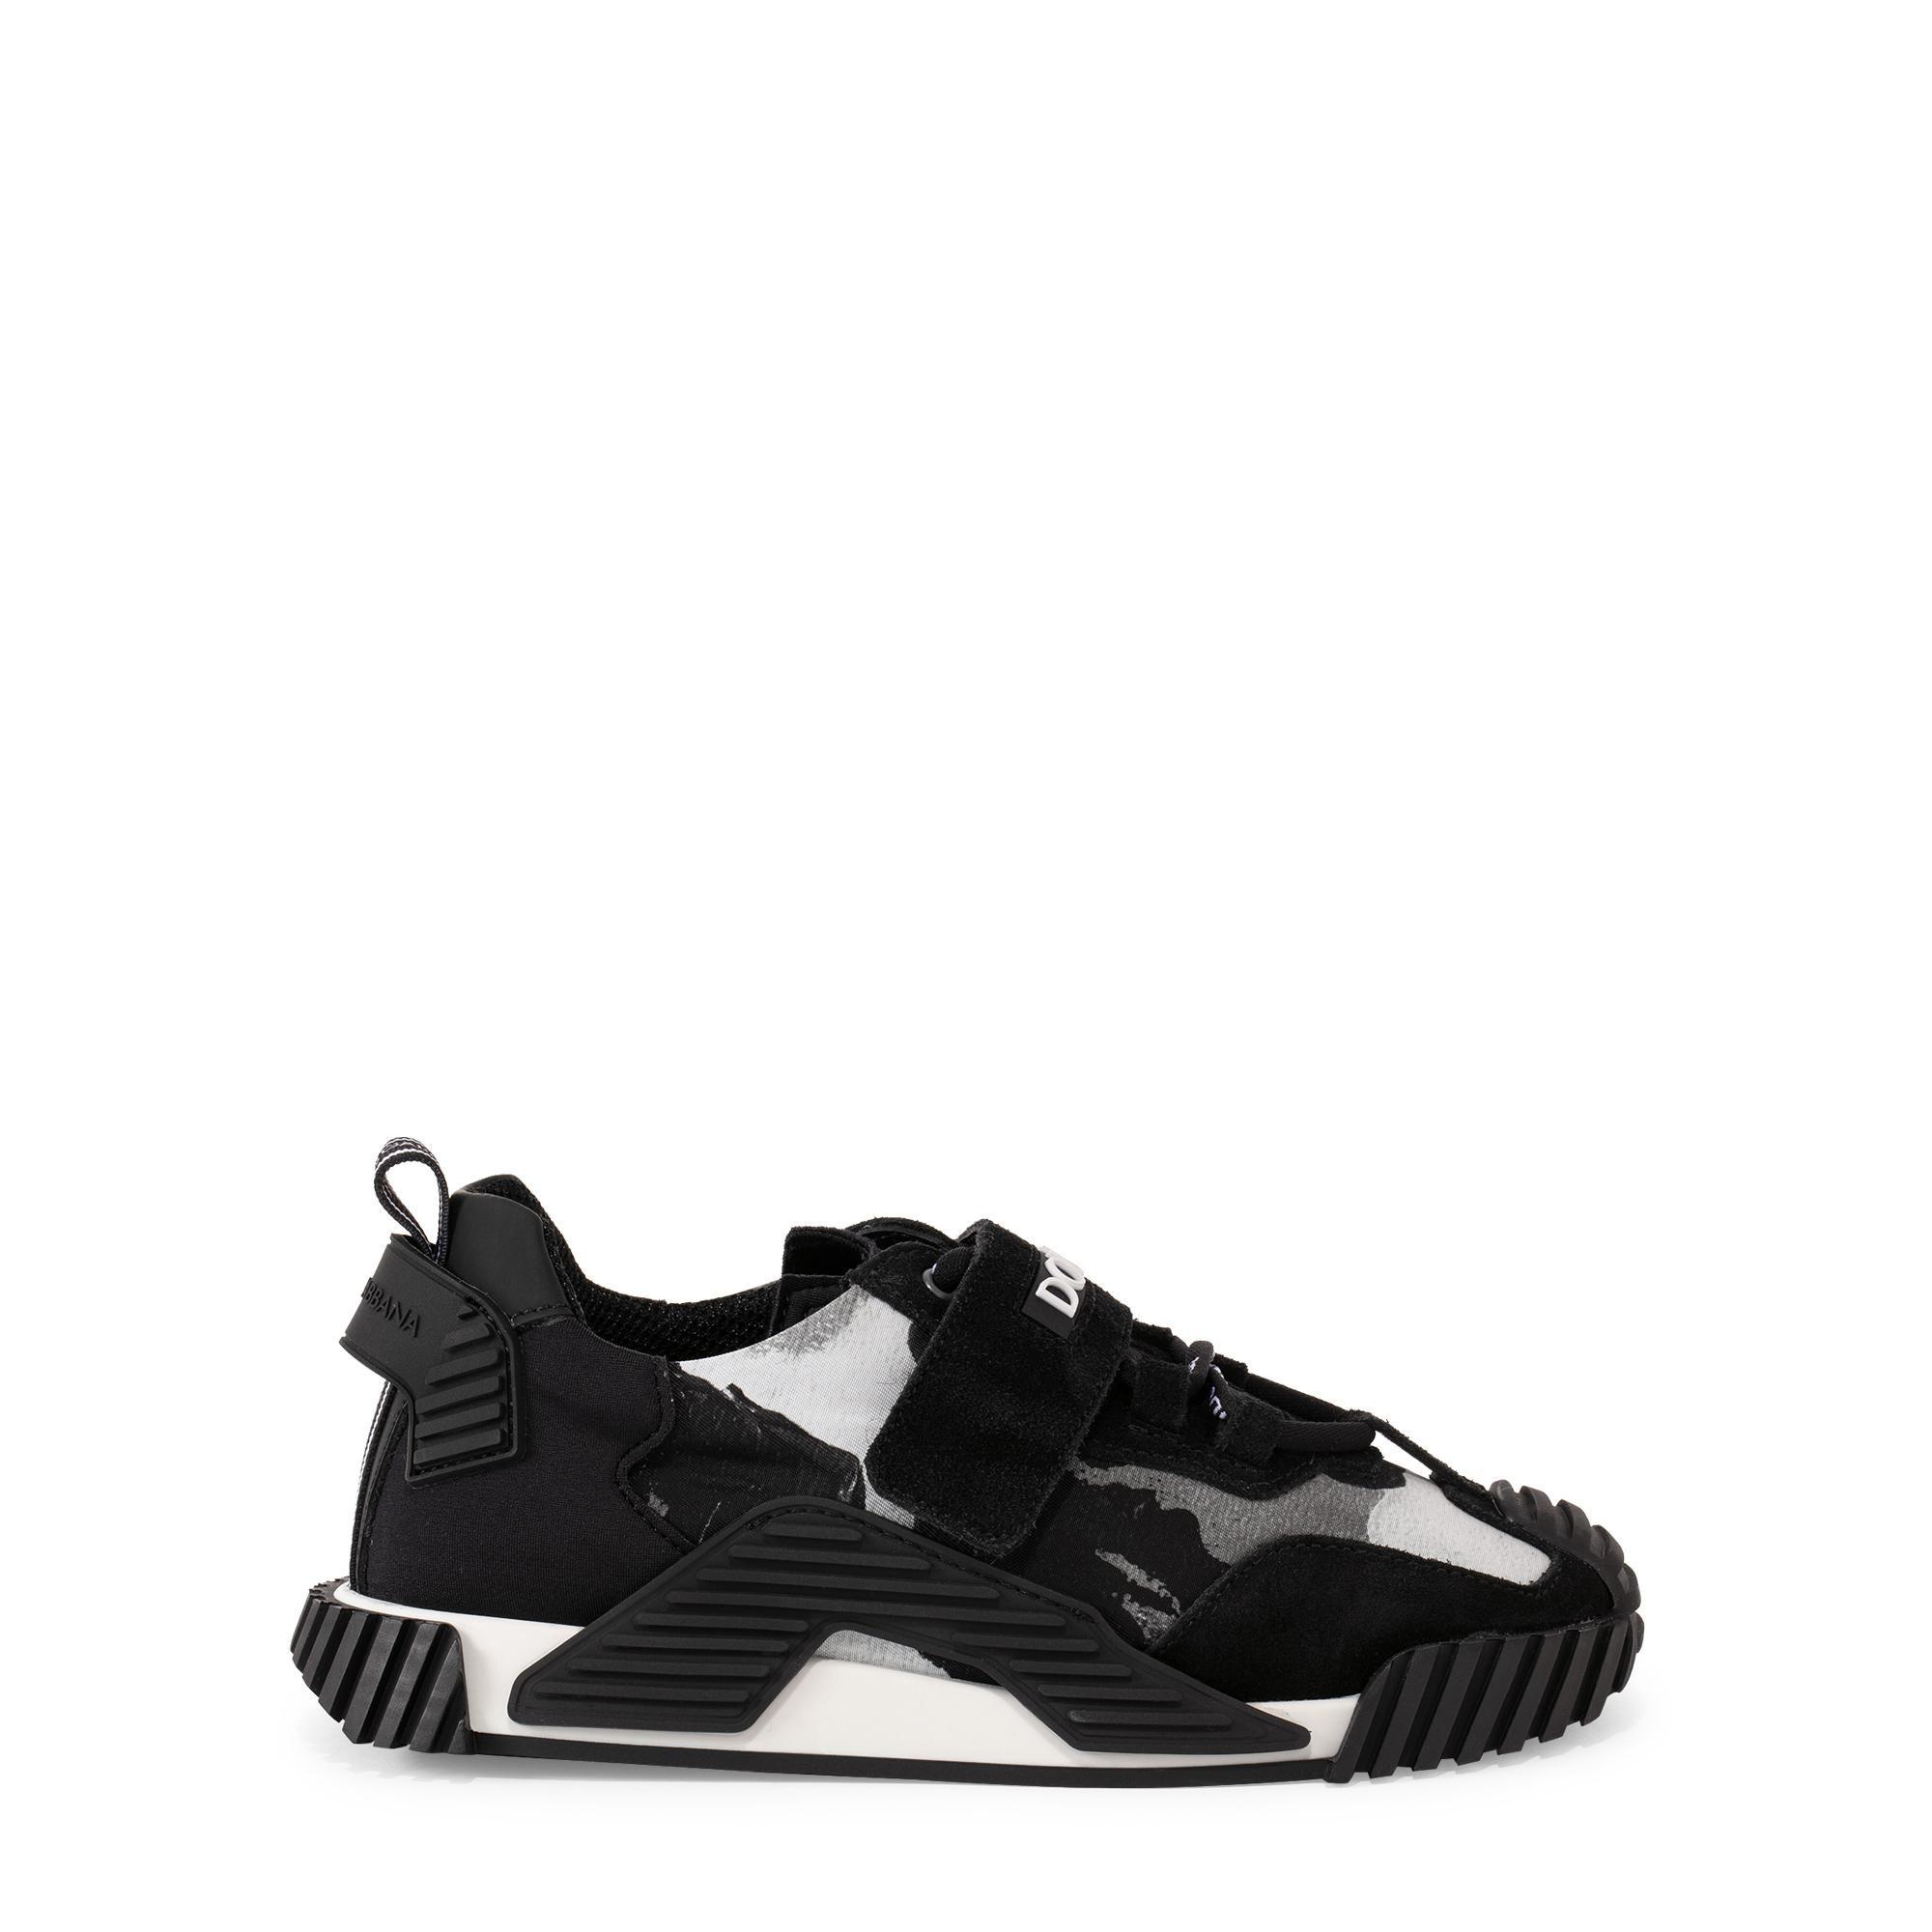 NS1 sneakers